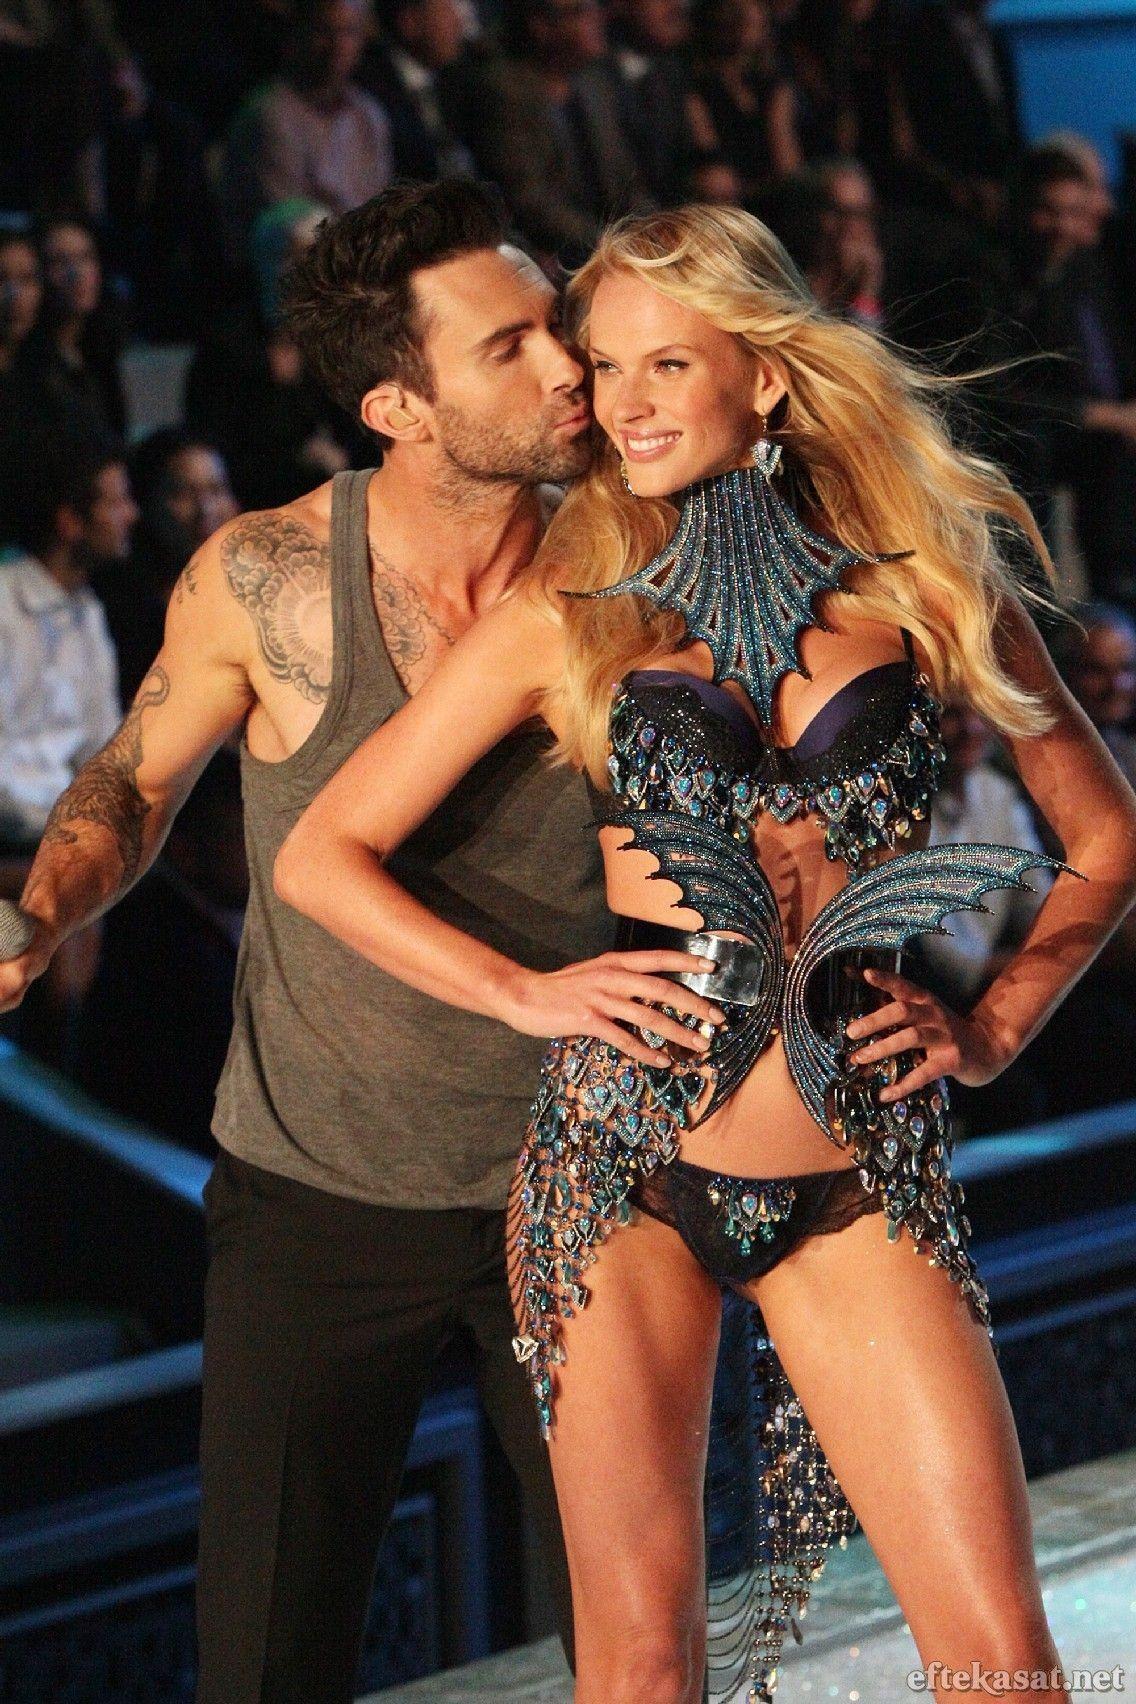 Adam Levine of Maroon 5 kissing girlfriend Anne Vyalitsina ...